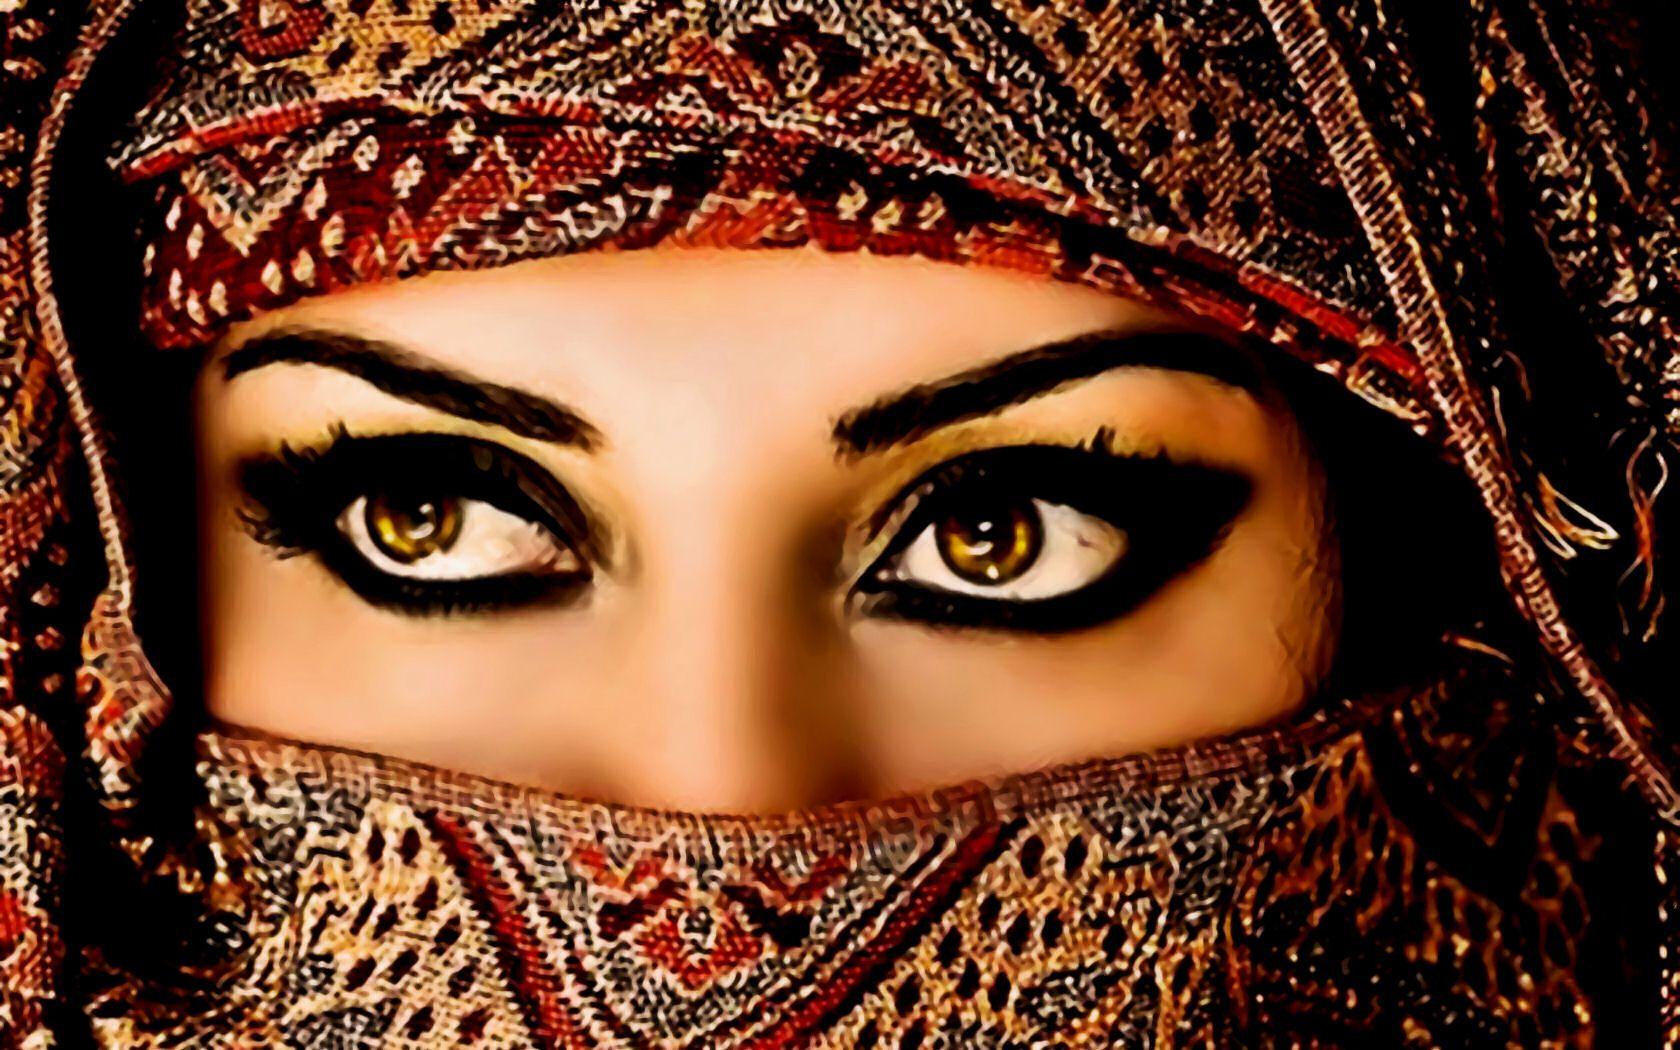 Arab dating sites kostenlos